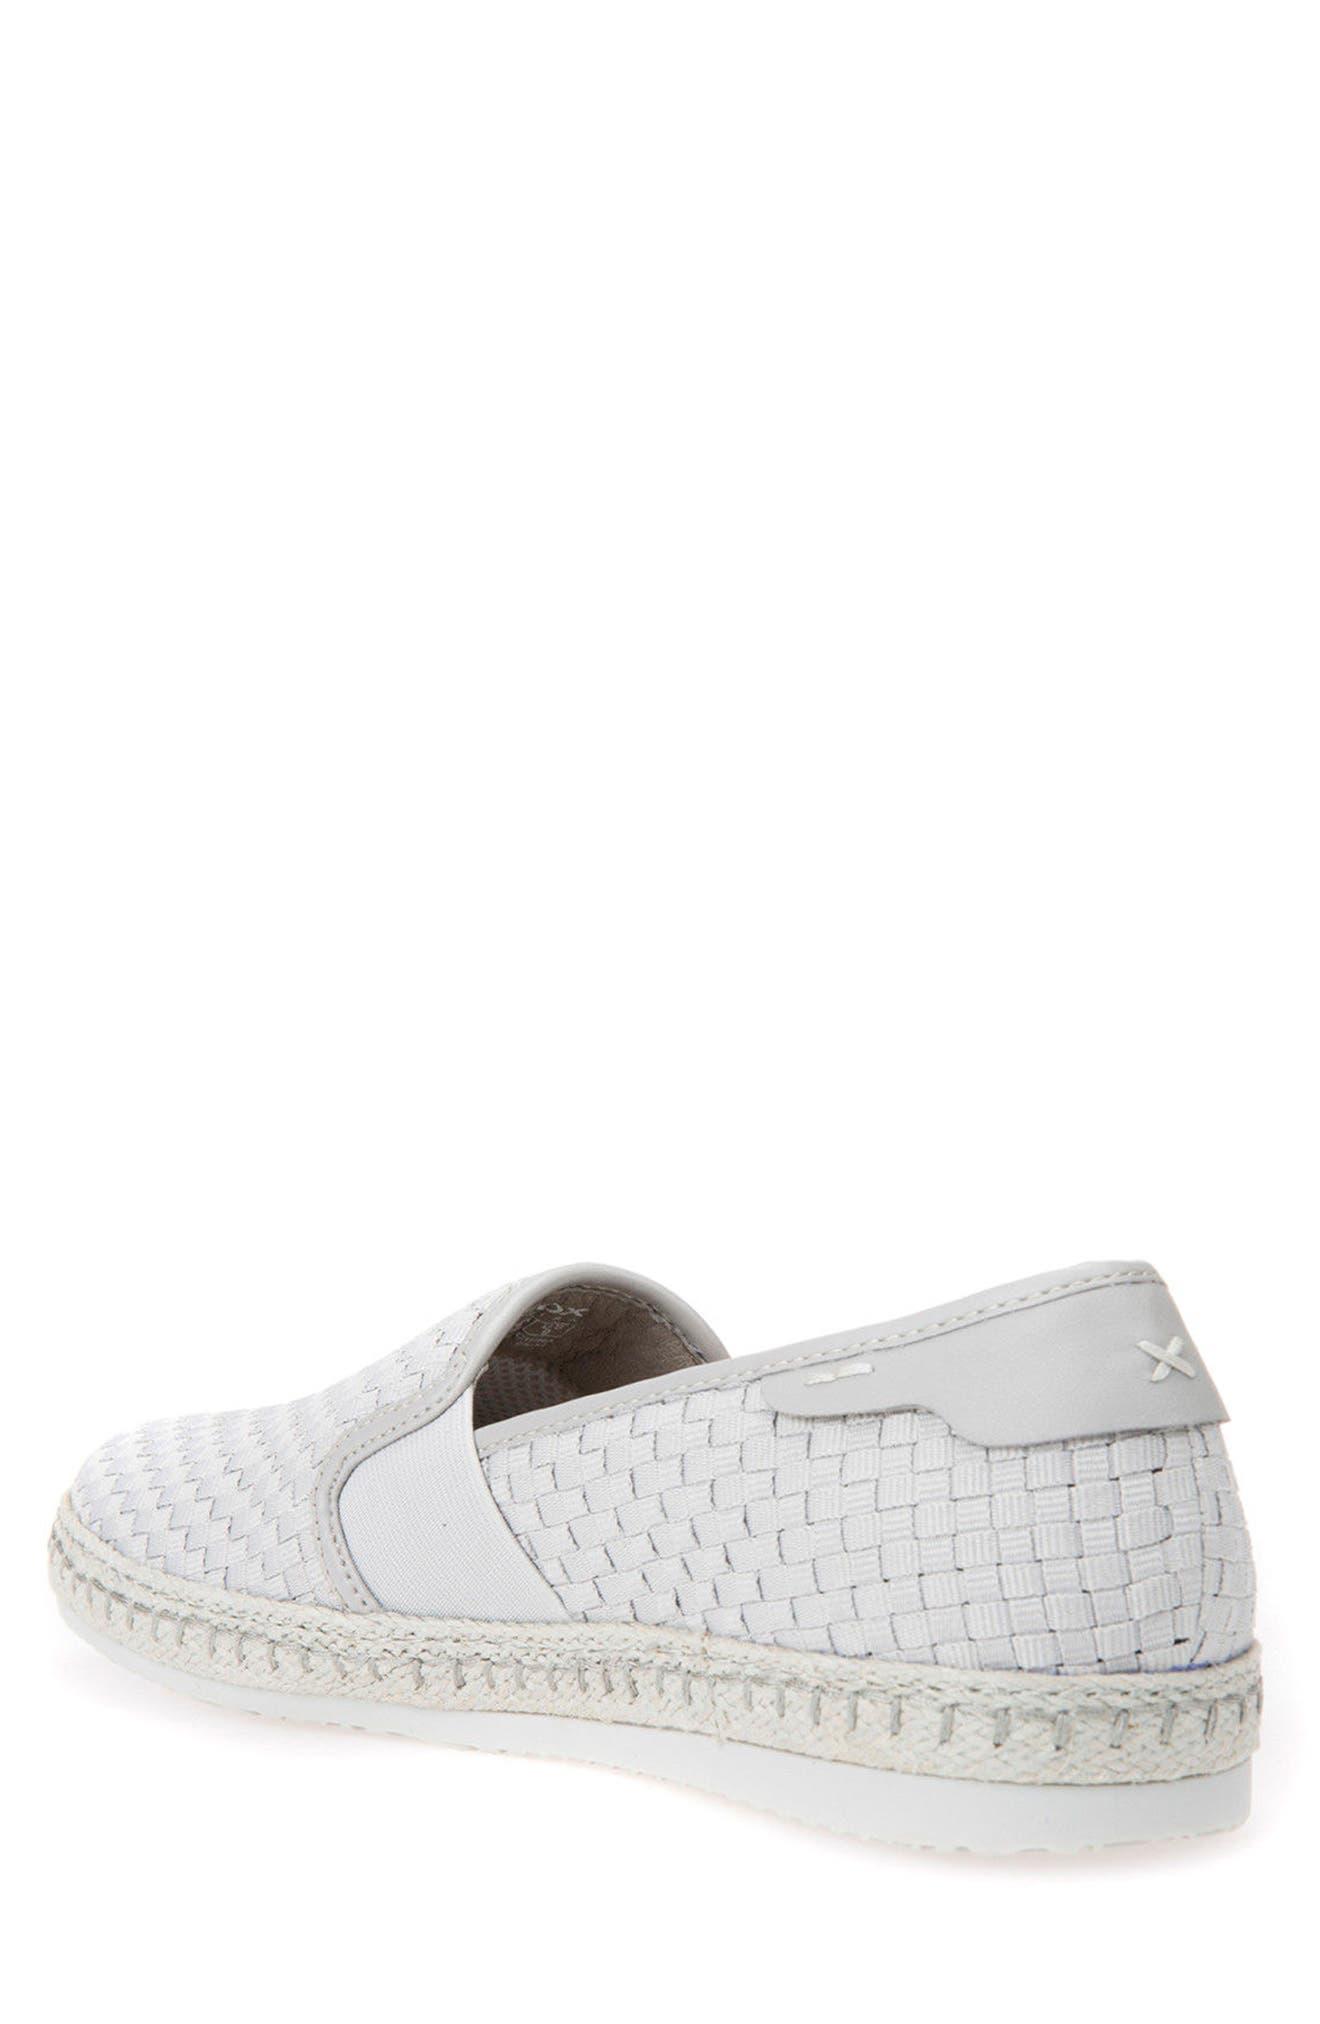 Copacaban 10 Woven Slip-On Sneaker,                             Alternate thumbnail 2, color,                             050